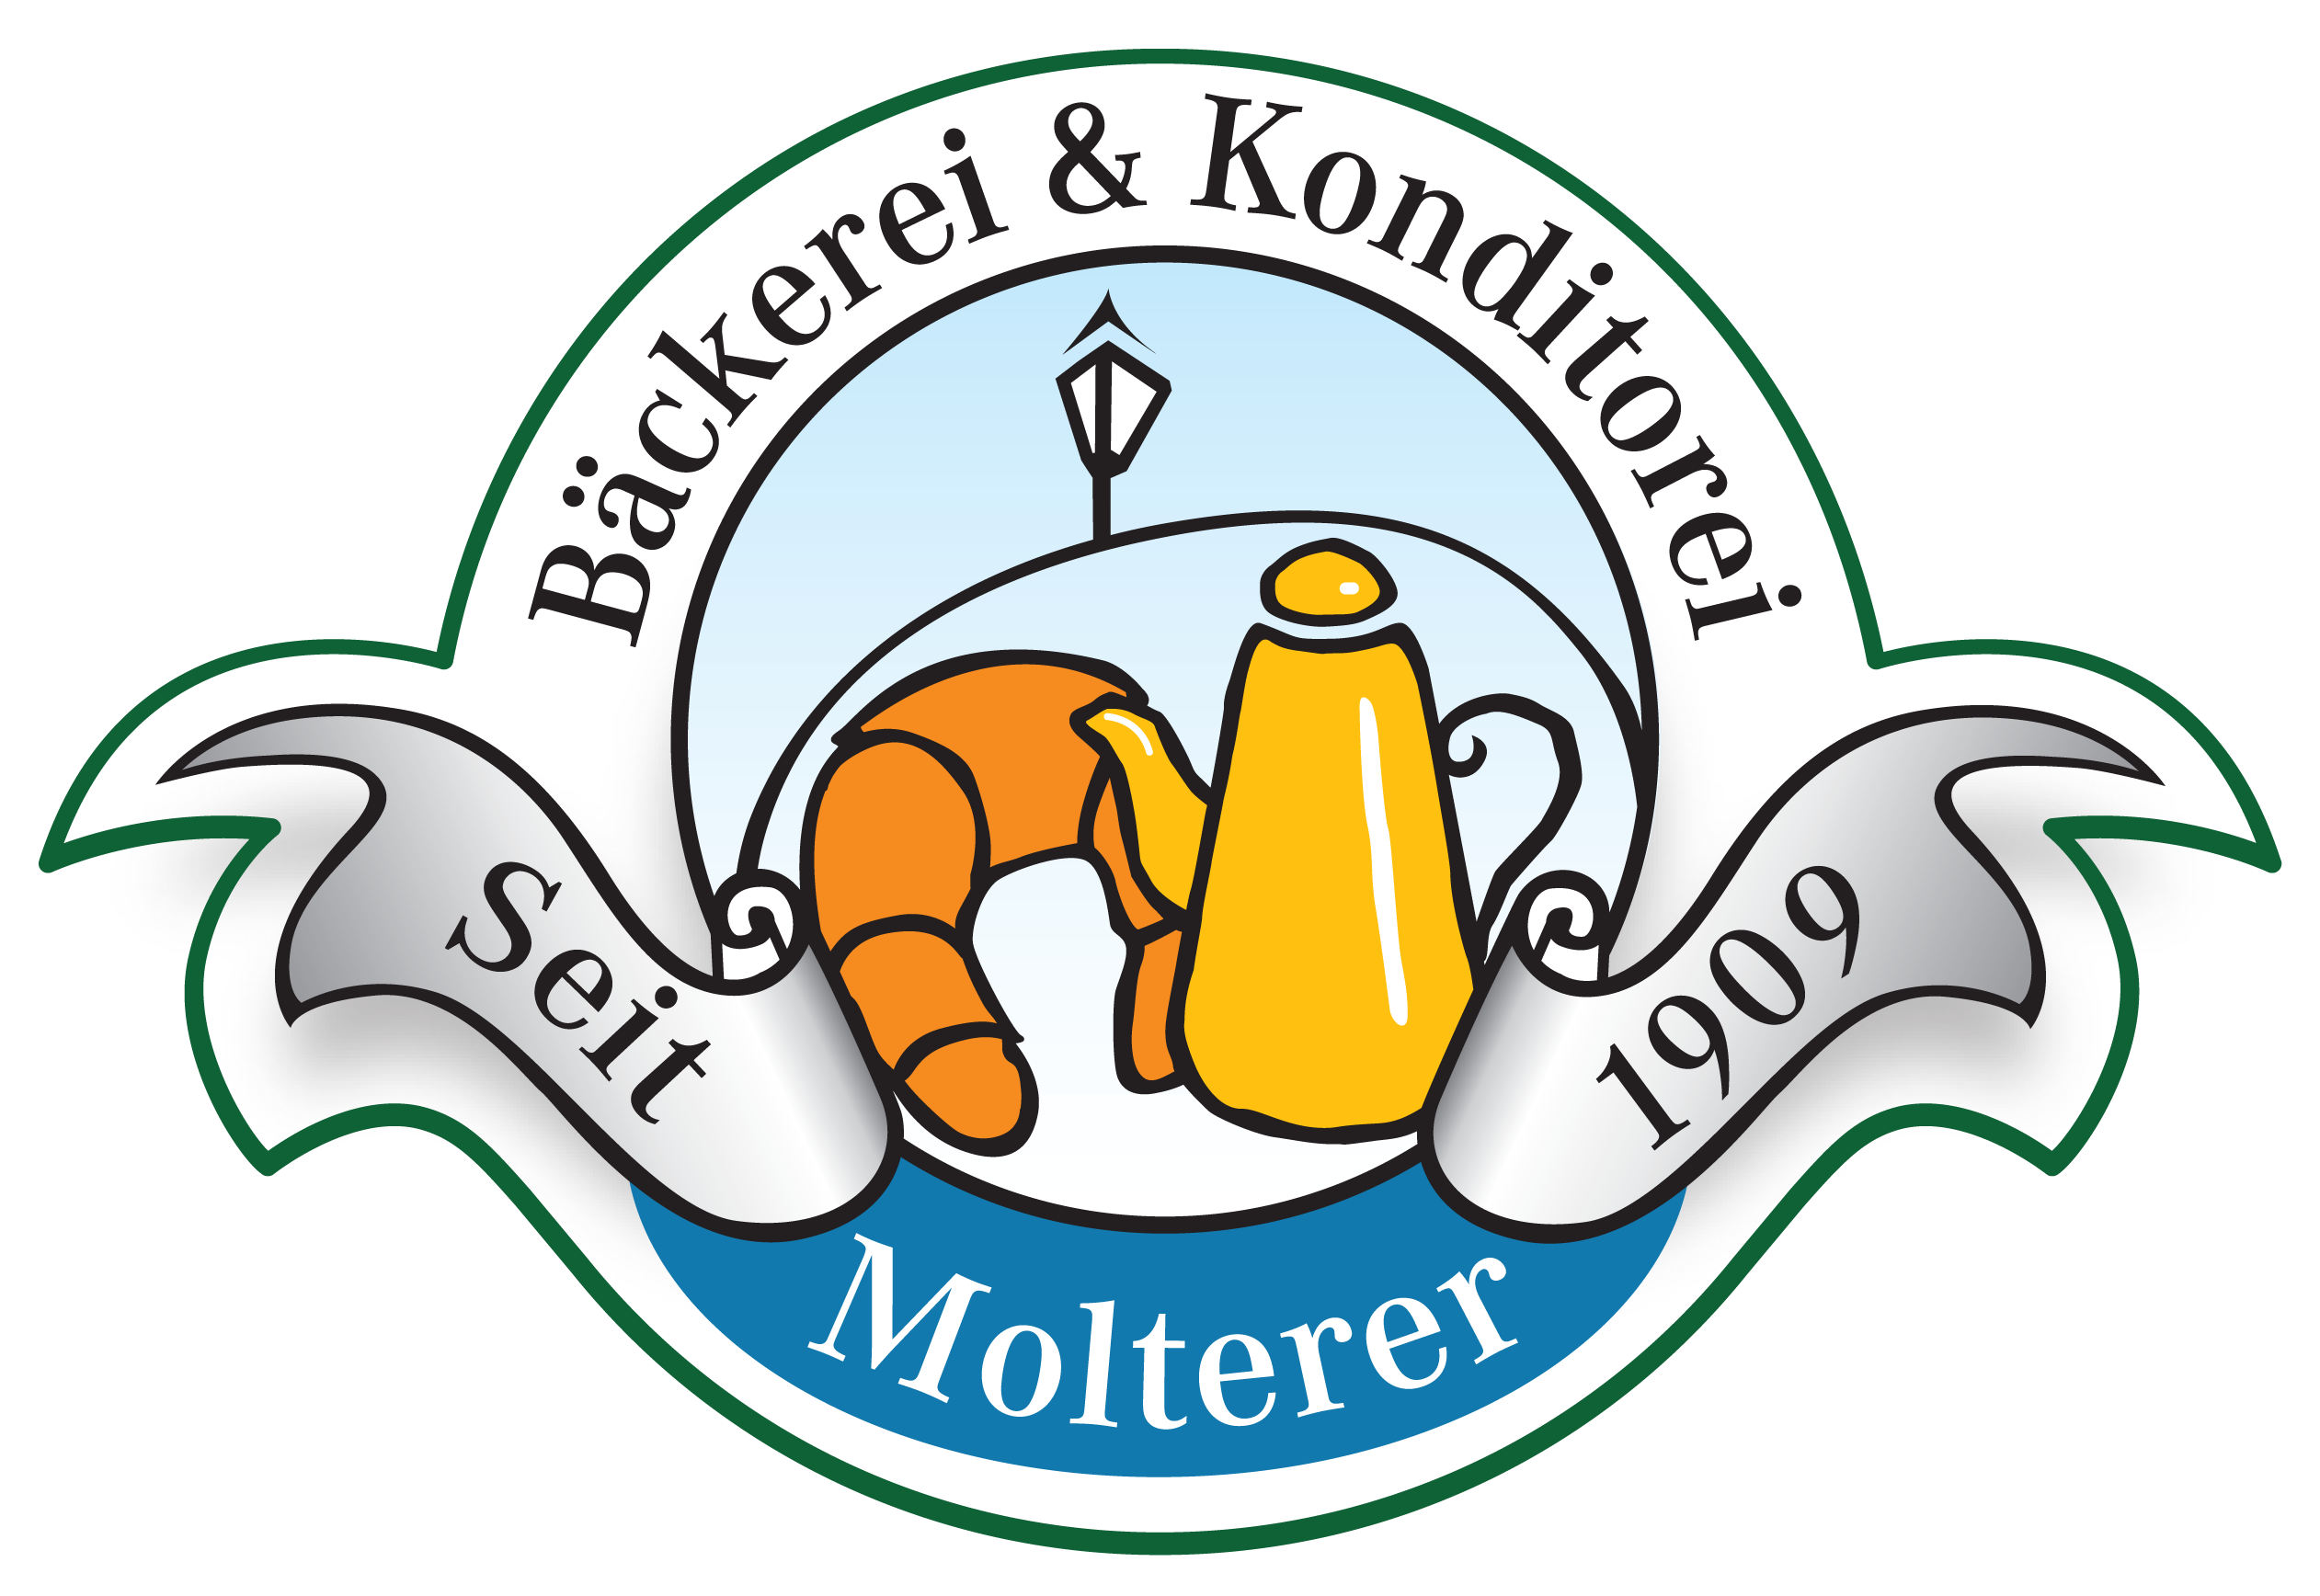 Bäckerei Moltererlogo 2